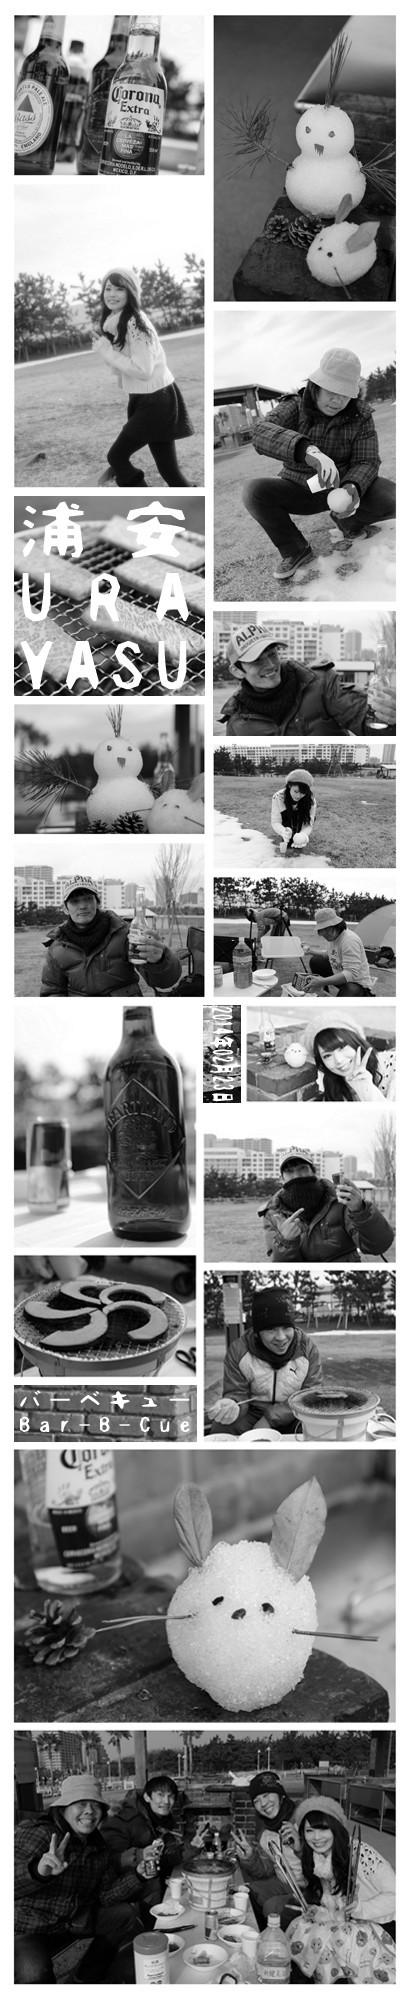 2014-02-23_c002.jpg